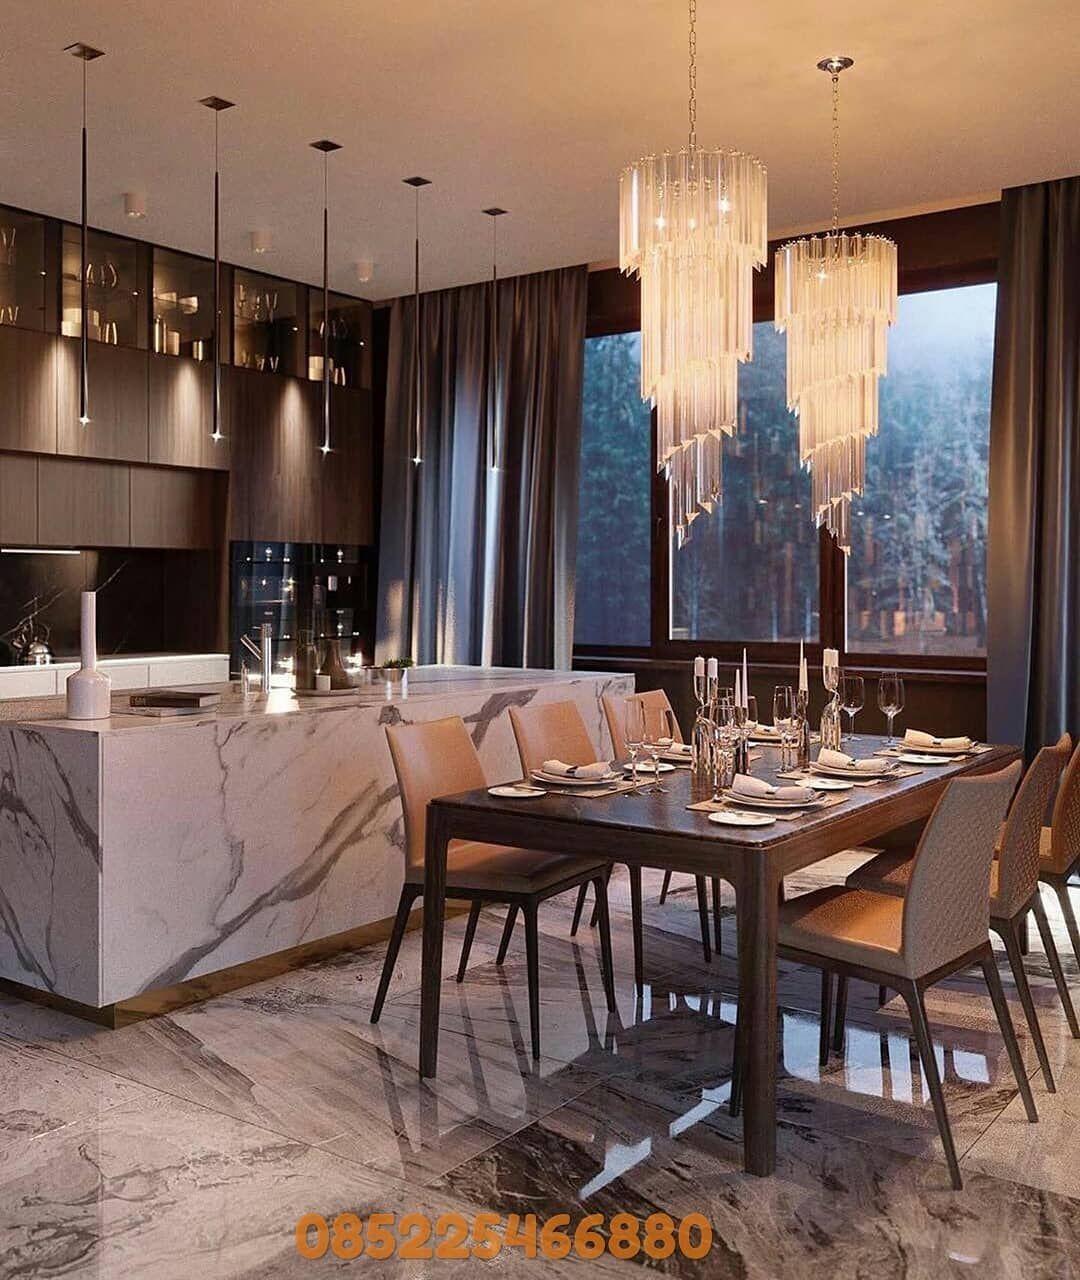 Info Dan Pemesanan Hubungi Wa 085225466880 Kursimakan Settamu Furnituresurabaya Setmakanmura Luxury Home Decor Luxury Kitchen Design Modern Kitchen Design